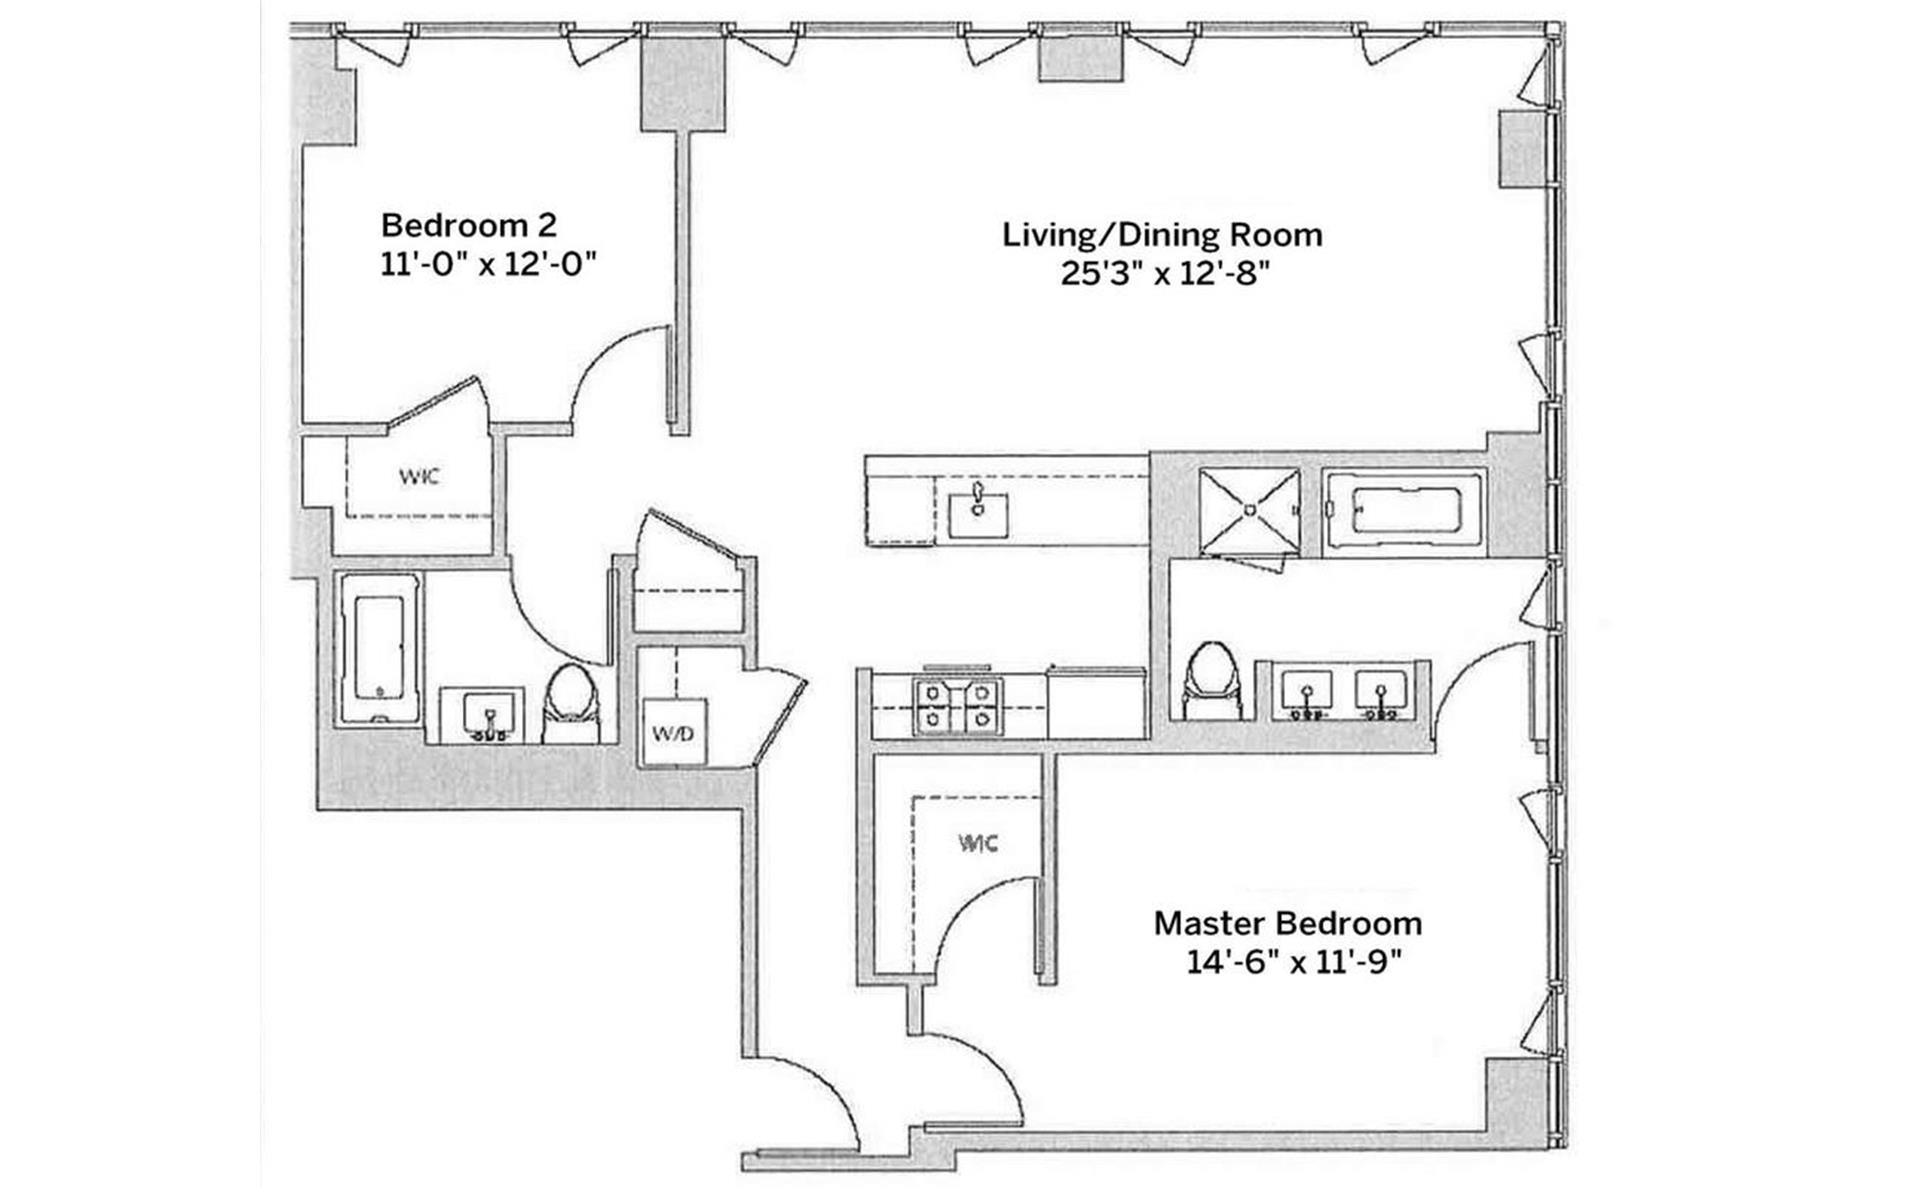 Floor plan of ONE TEN 3RD, 110 Third Avenue, 17B - East Village, New York